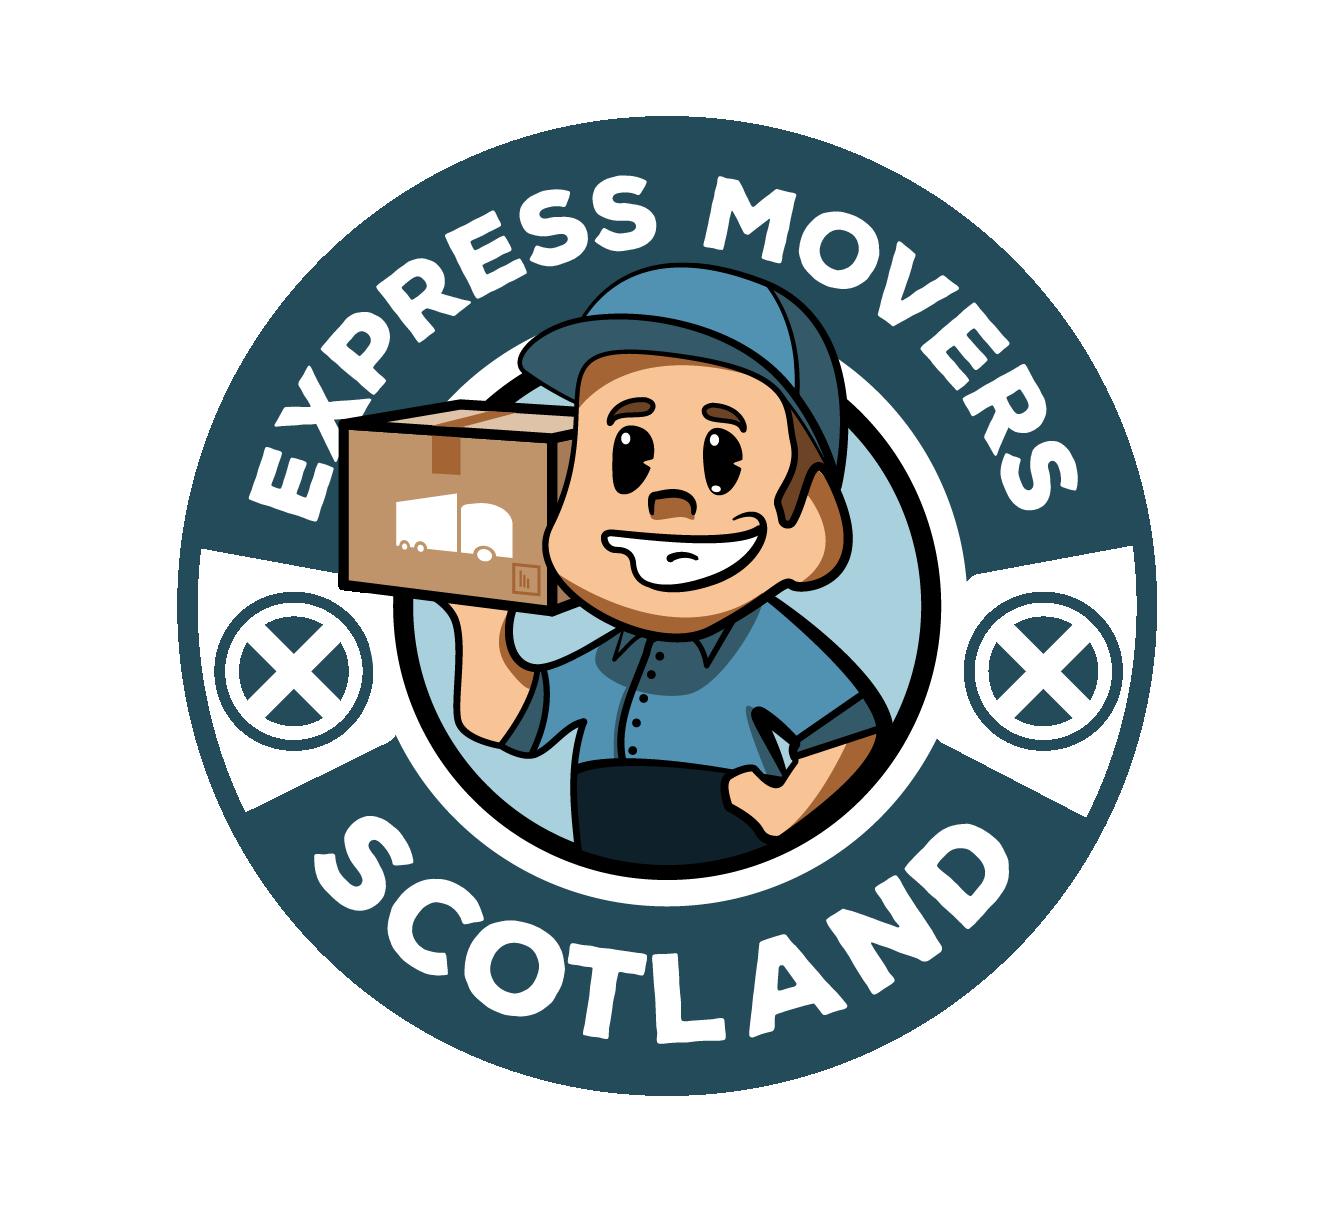 Vizard design freelance graphic designer logo design express logo design for van removal company in scotland called express movers scotland biocorpaavc Gallery